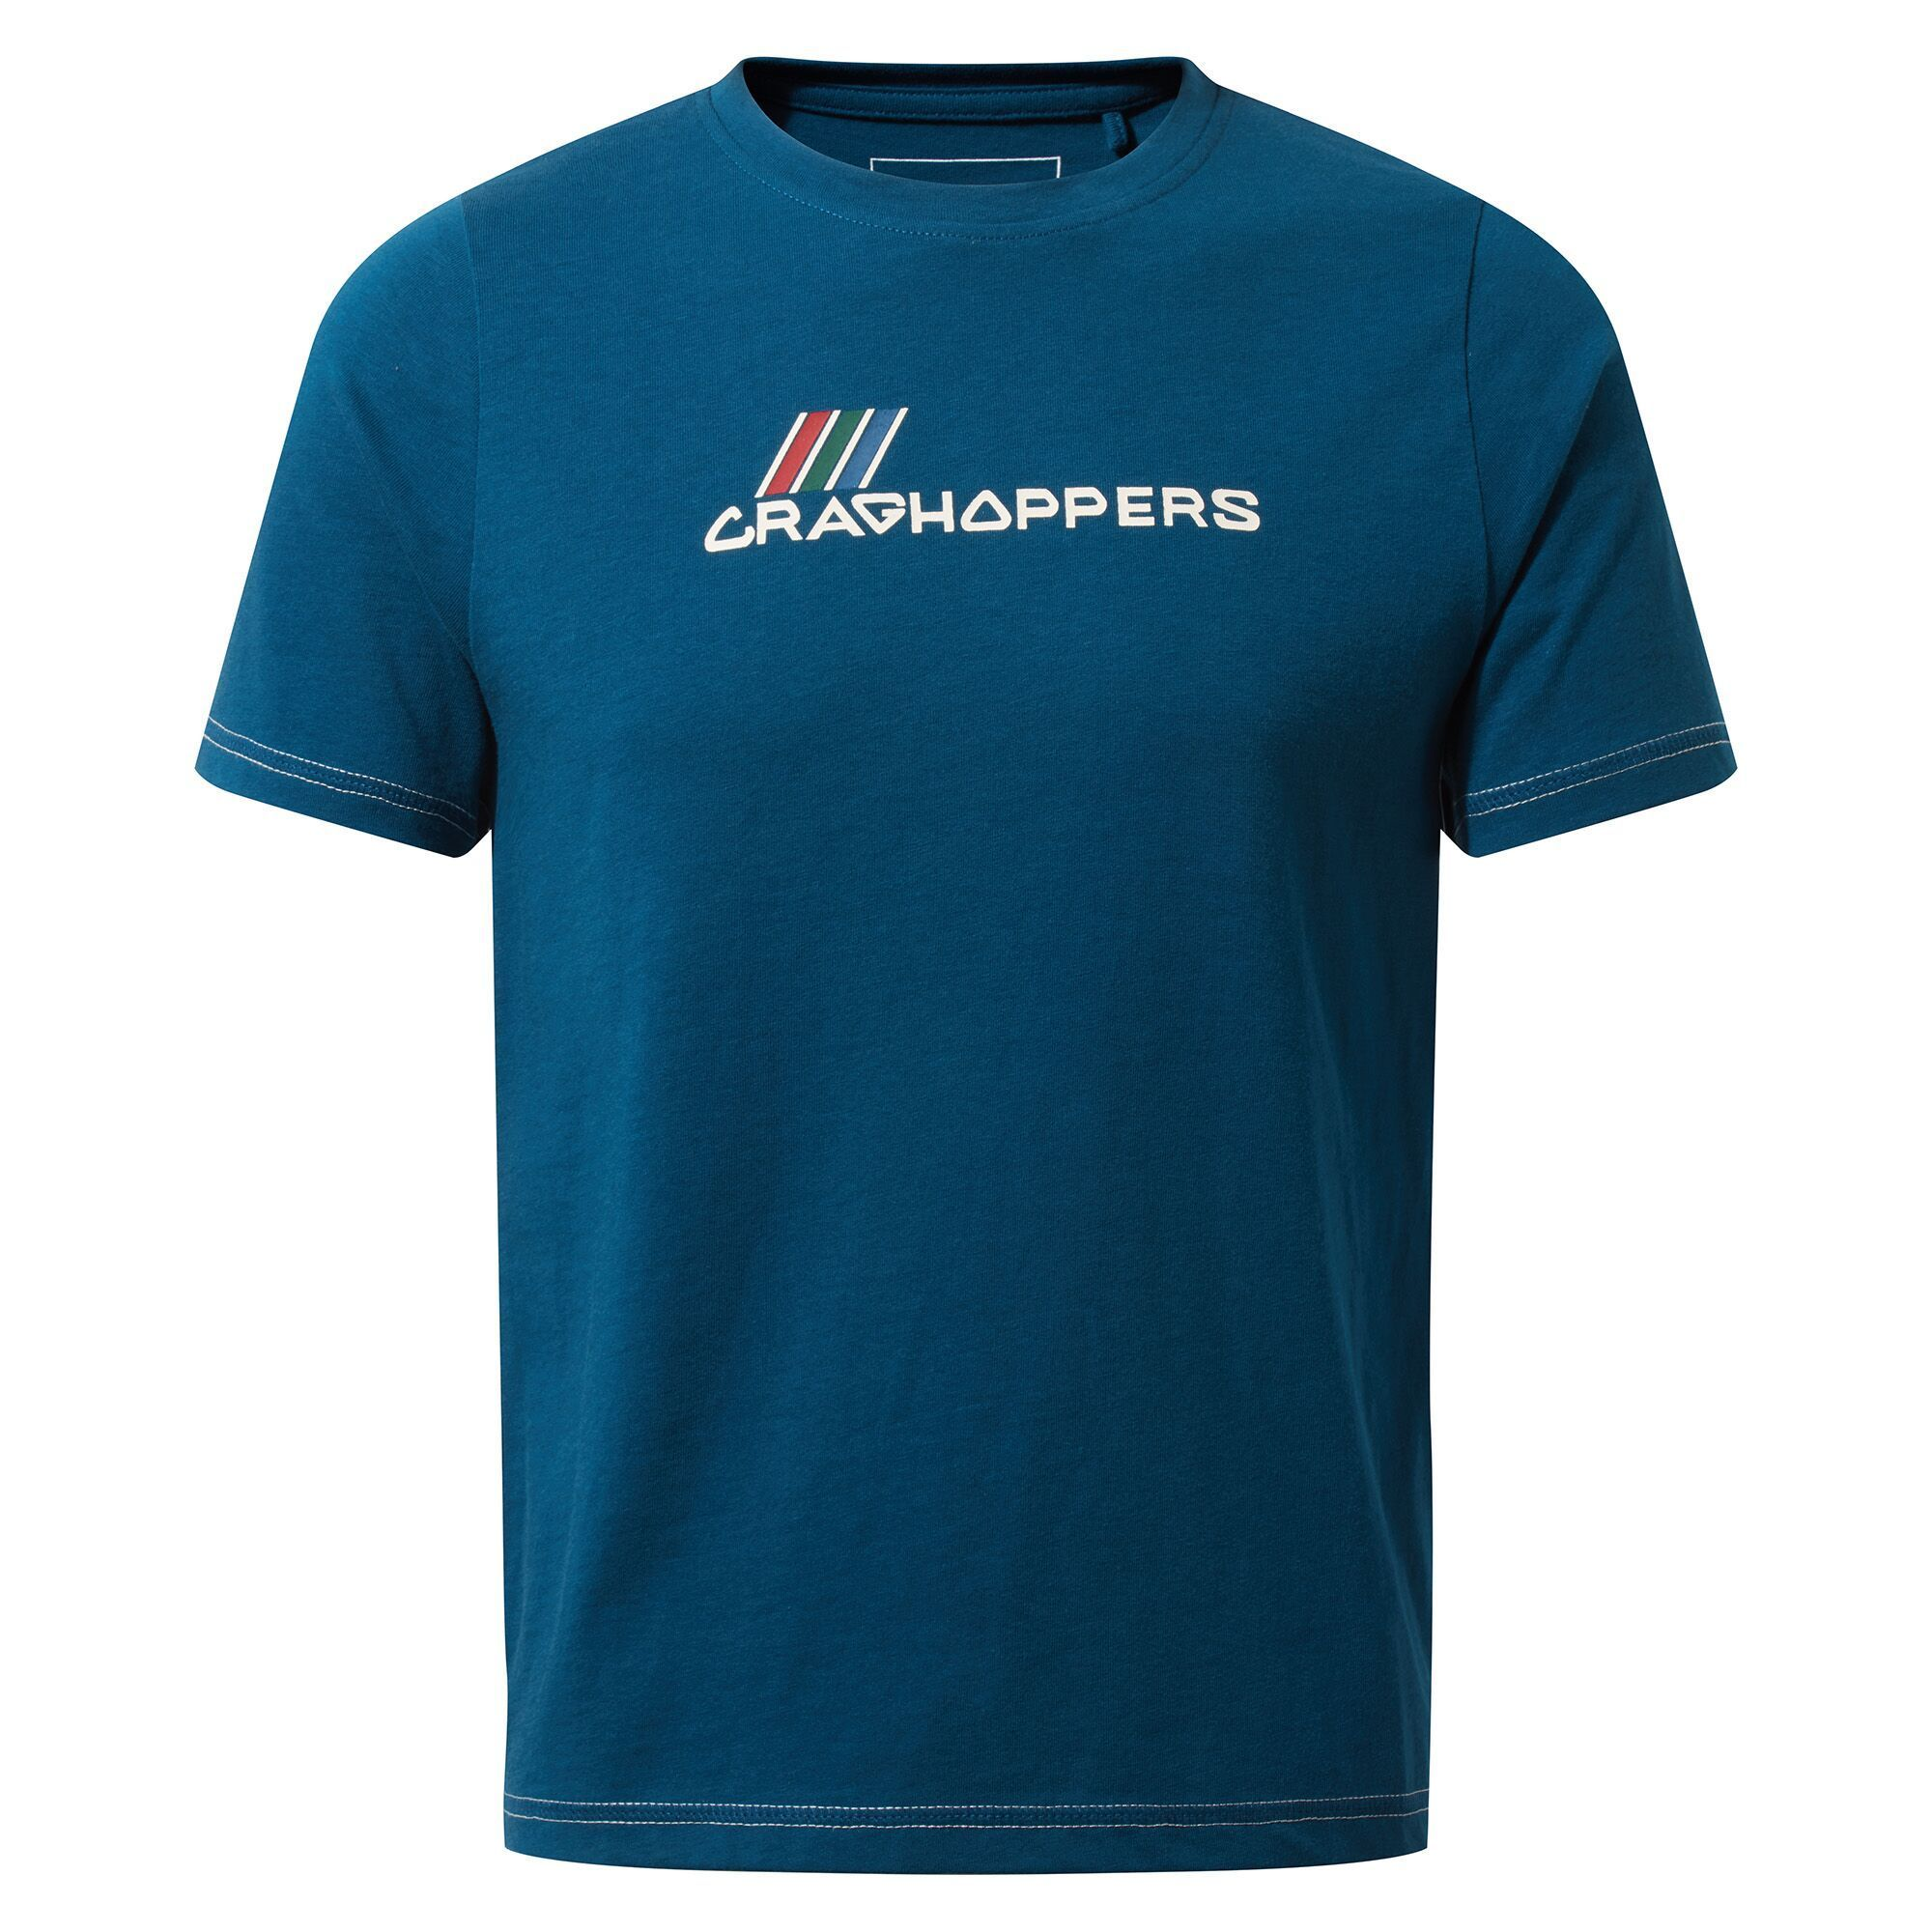 Craghoppers Childrens/Kids Gibbon Logo T-Shirt (Poseidon Blue)